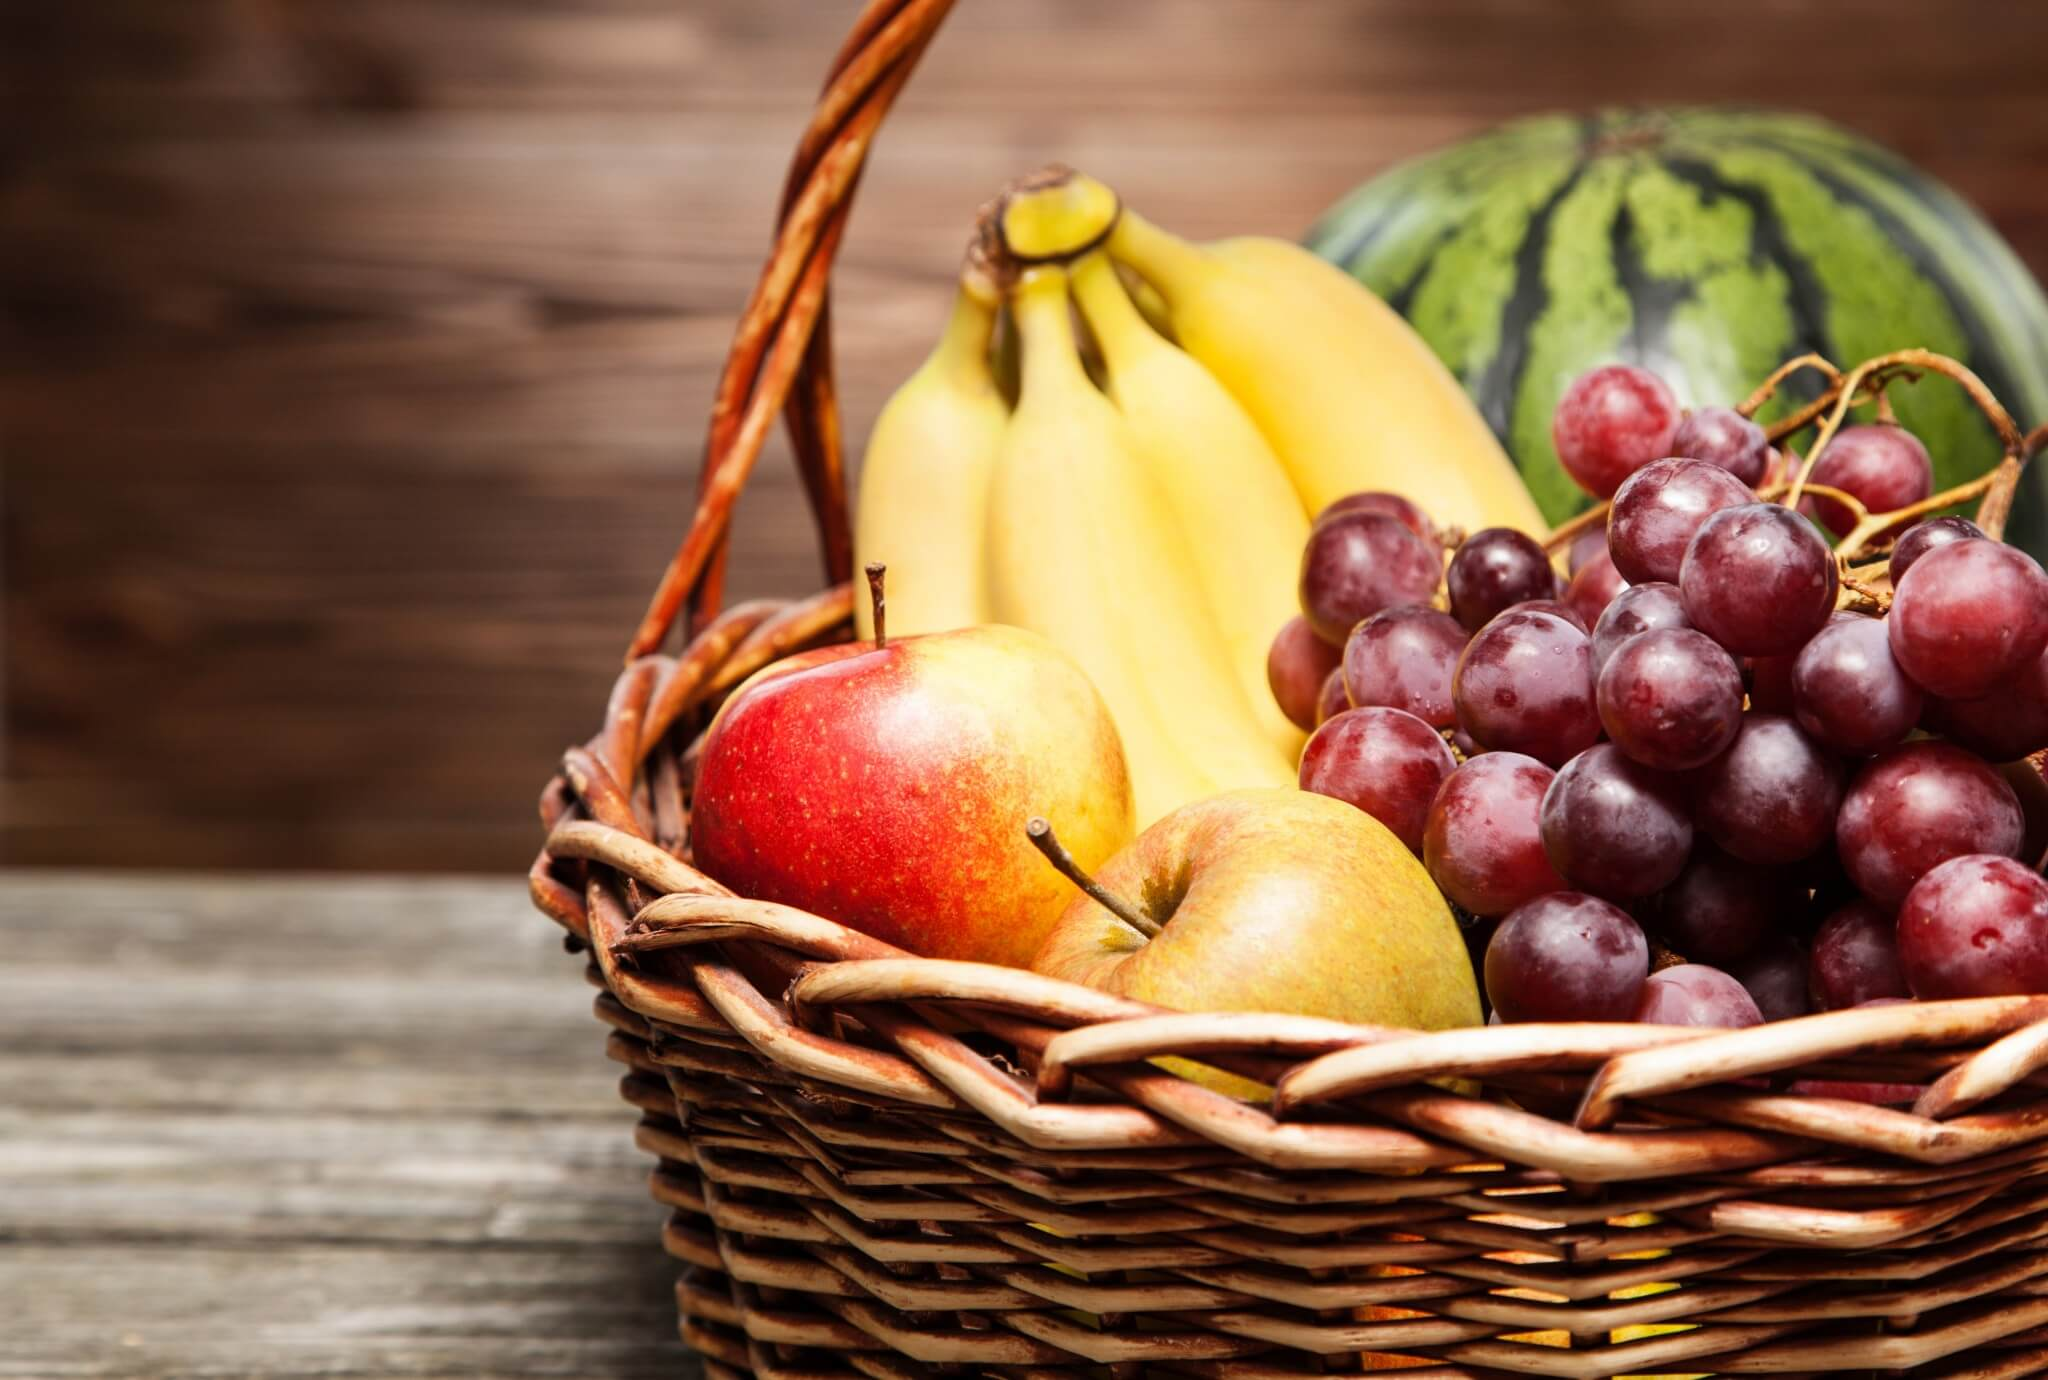 Foodesign Fresh Fruit Basket: St. Louis Produce Delivery